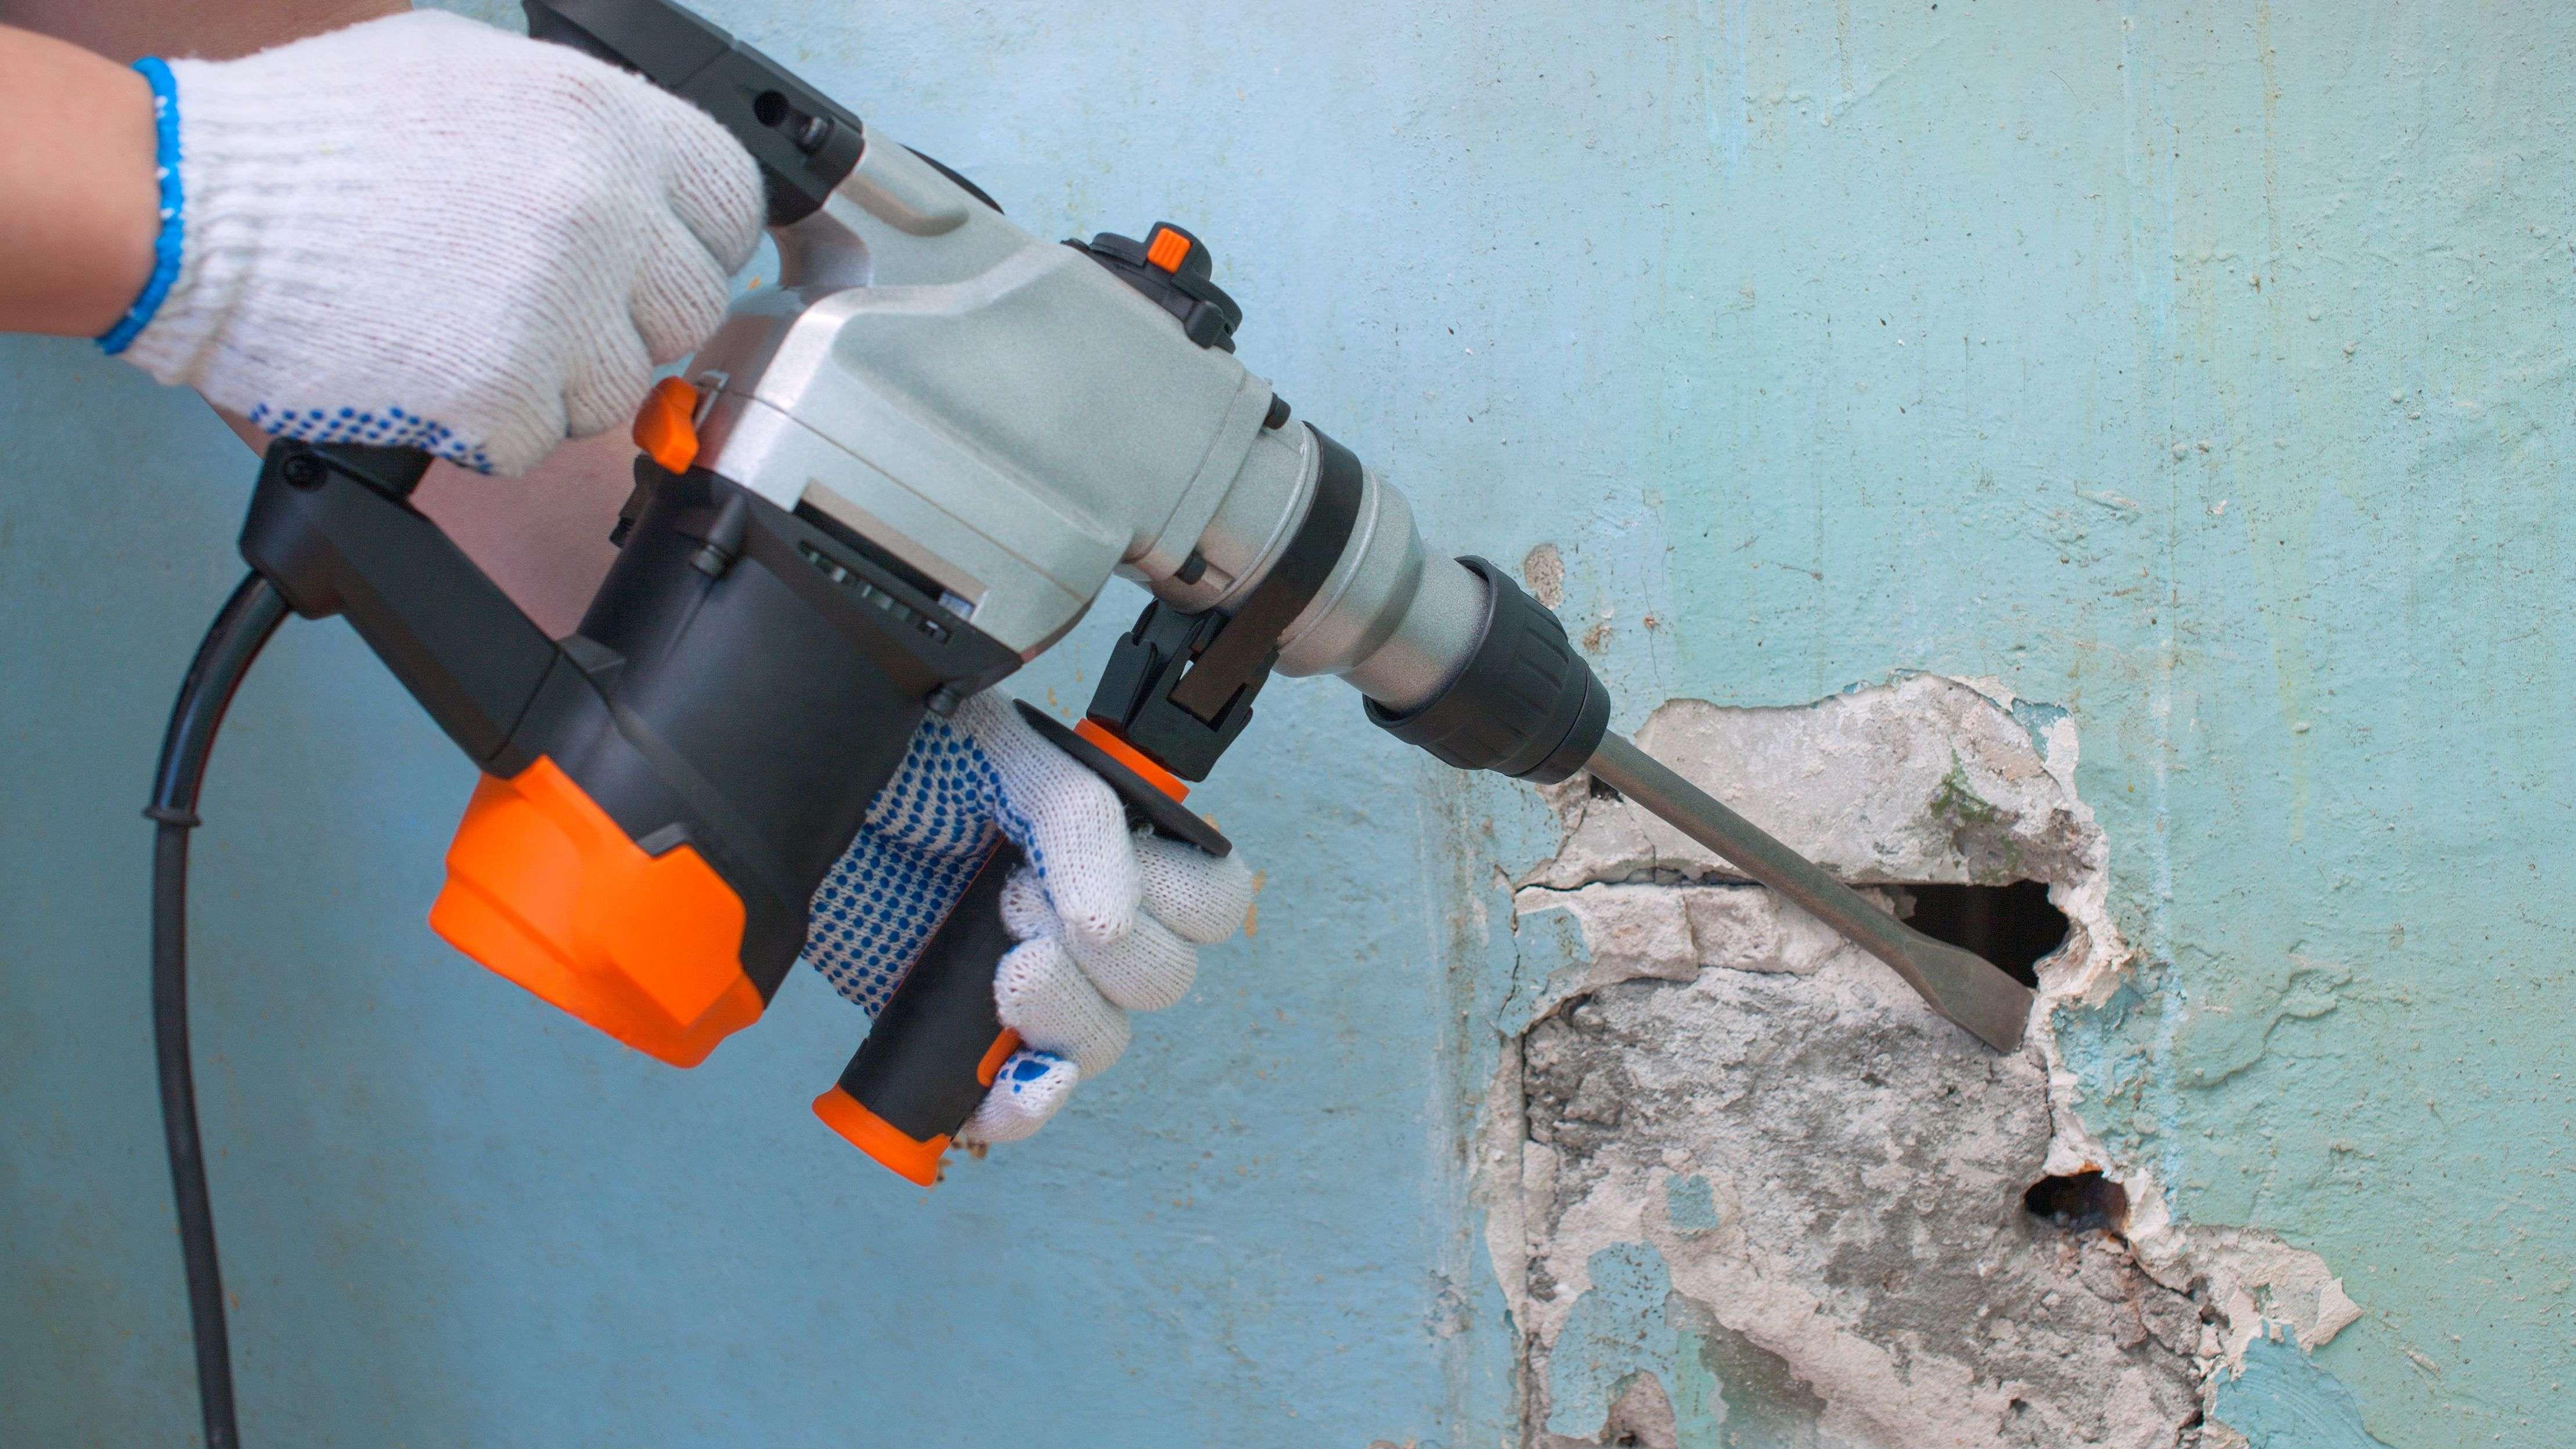 Comment choisir son perforateur burineur